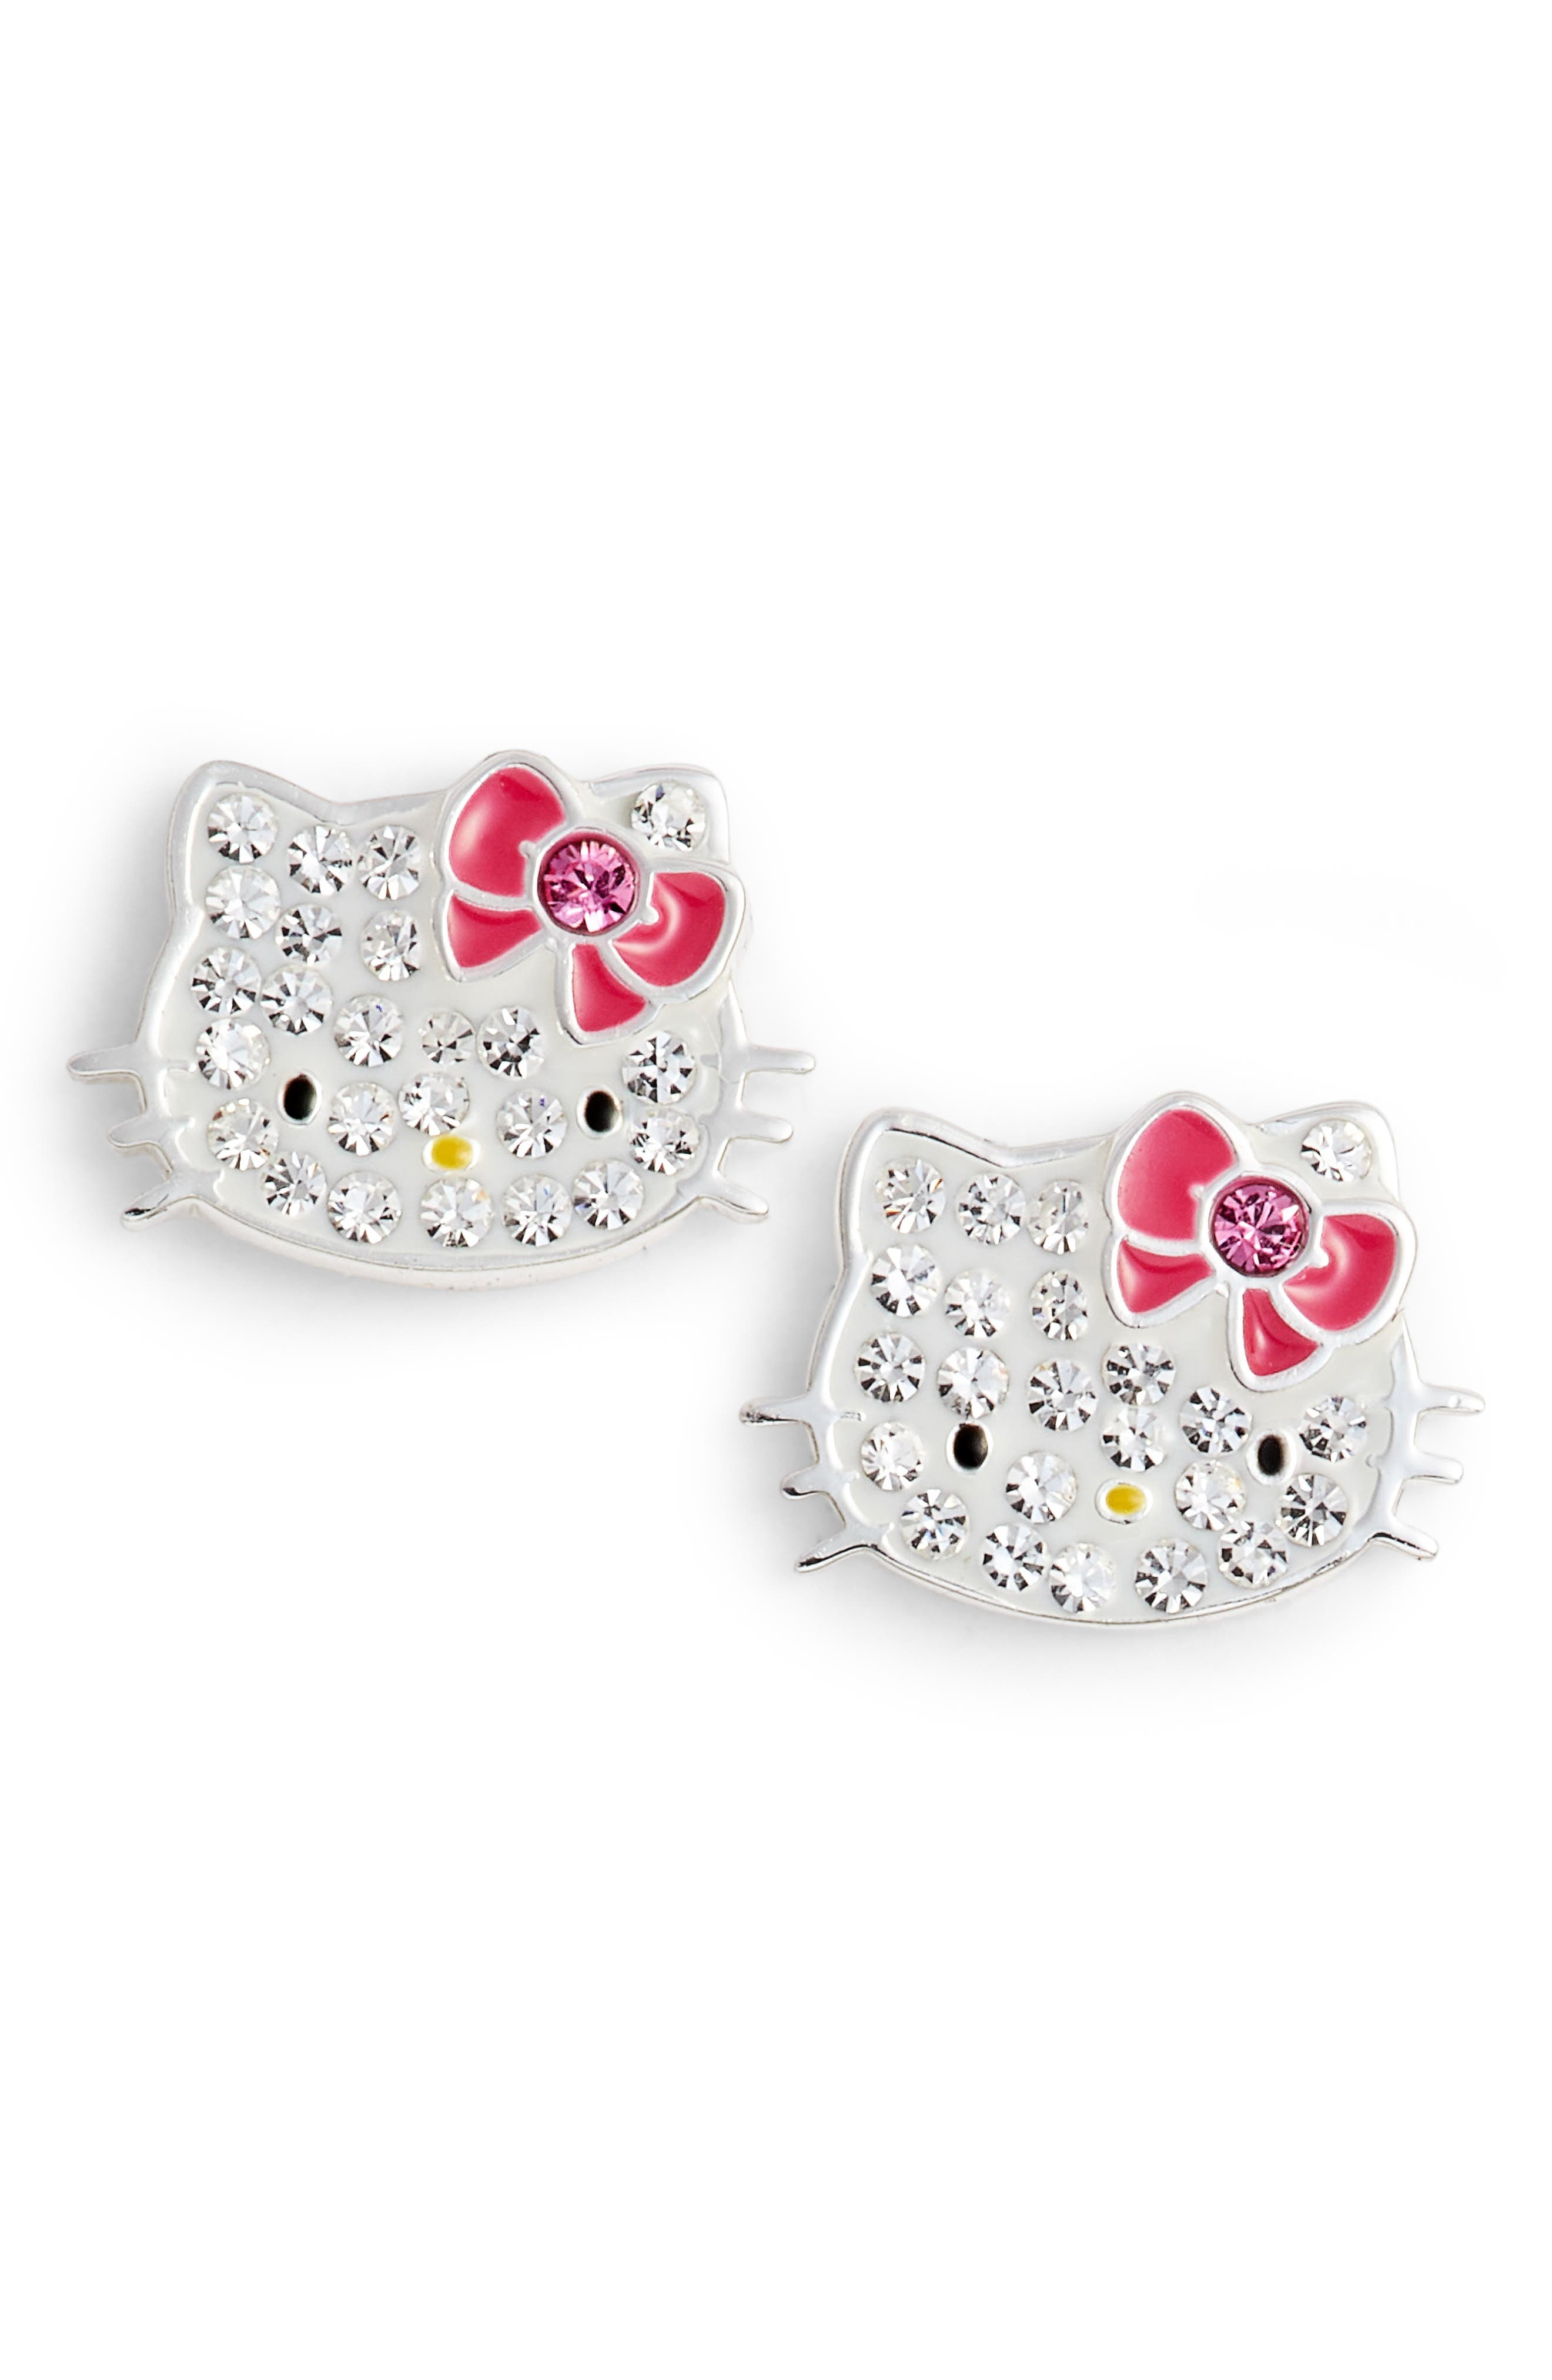 Crystal Stud Earrings,                             Main thumbnail 1, color,                             040